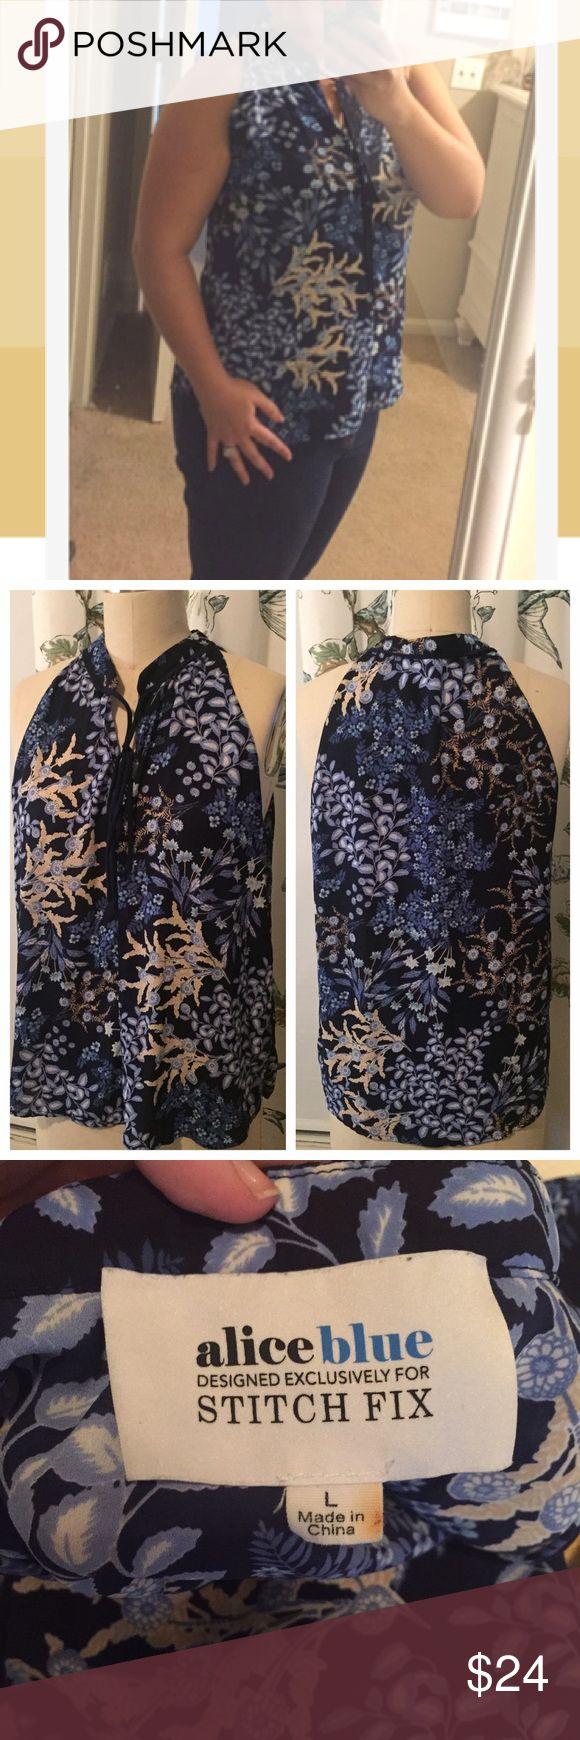 736c04fda83 Alice Blue for Stitch Fix Melisandre Tie Neck Top